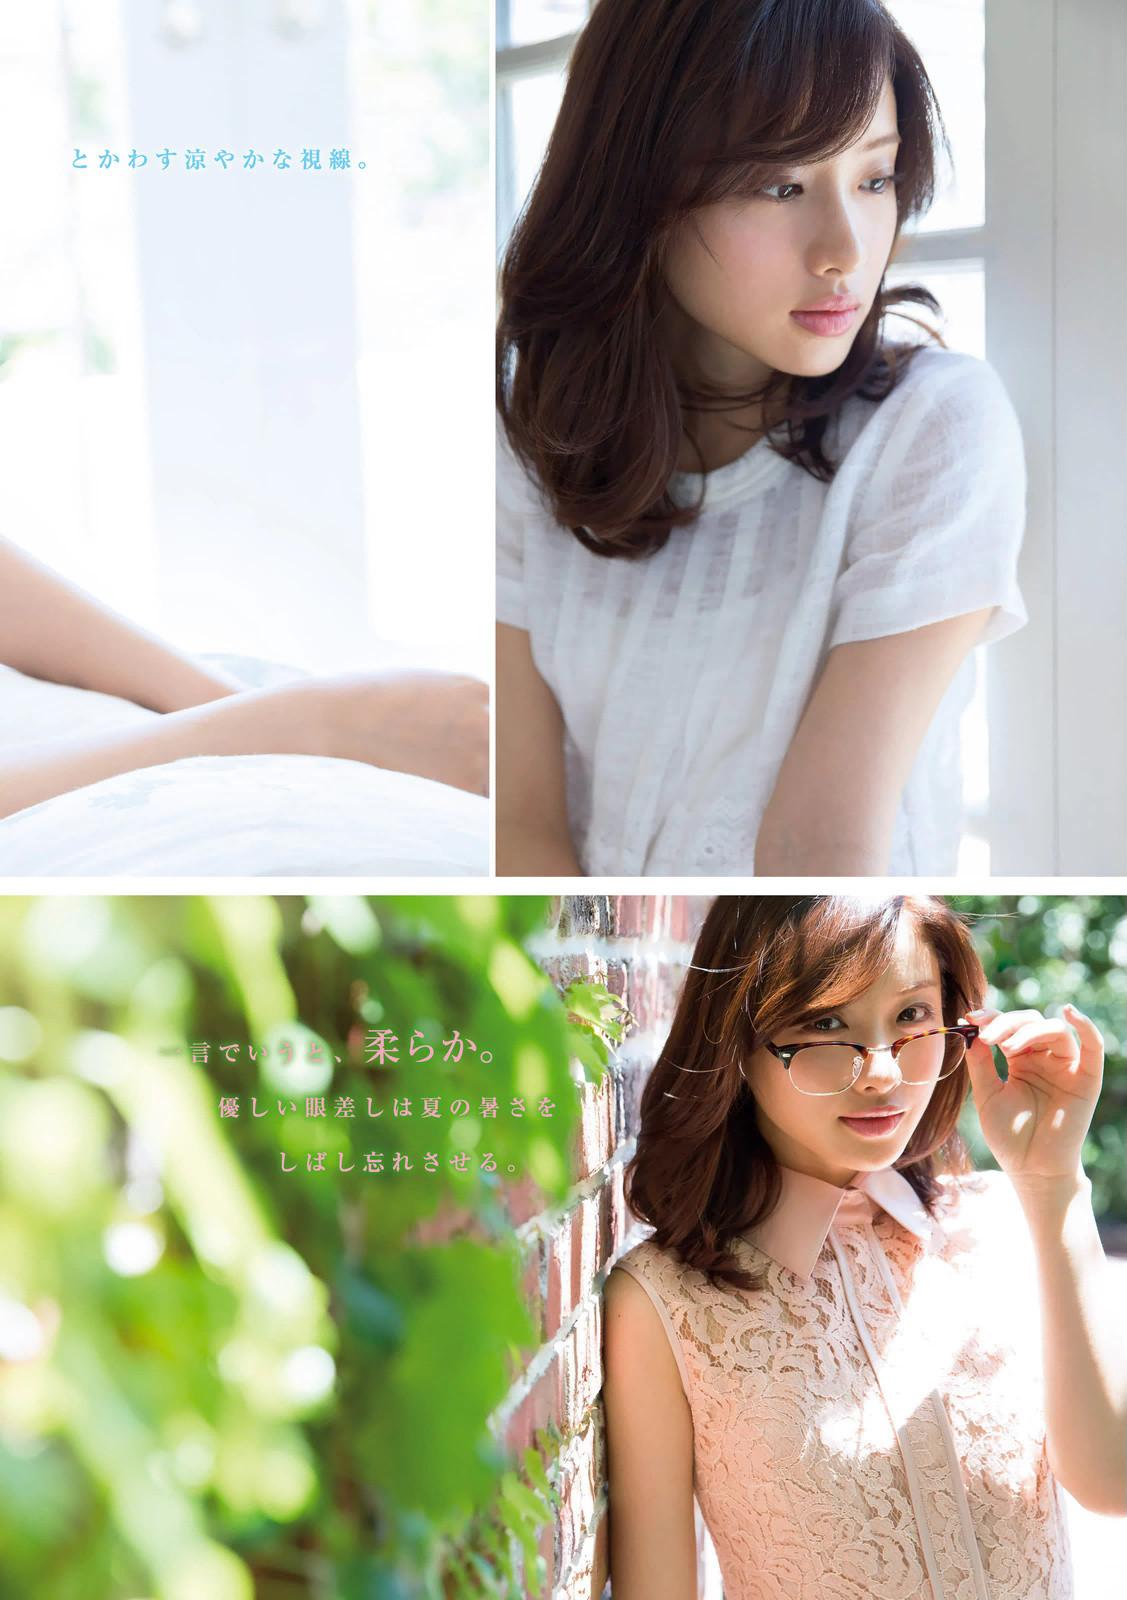 http://upimg.tokimeki-s.com/2015/08/55ca22a49f3e6.jpg